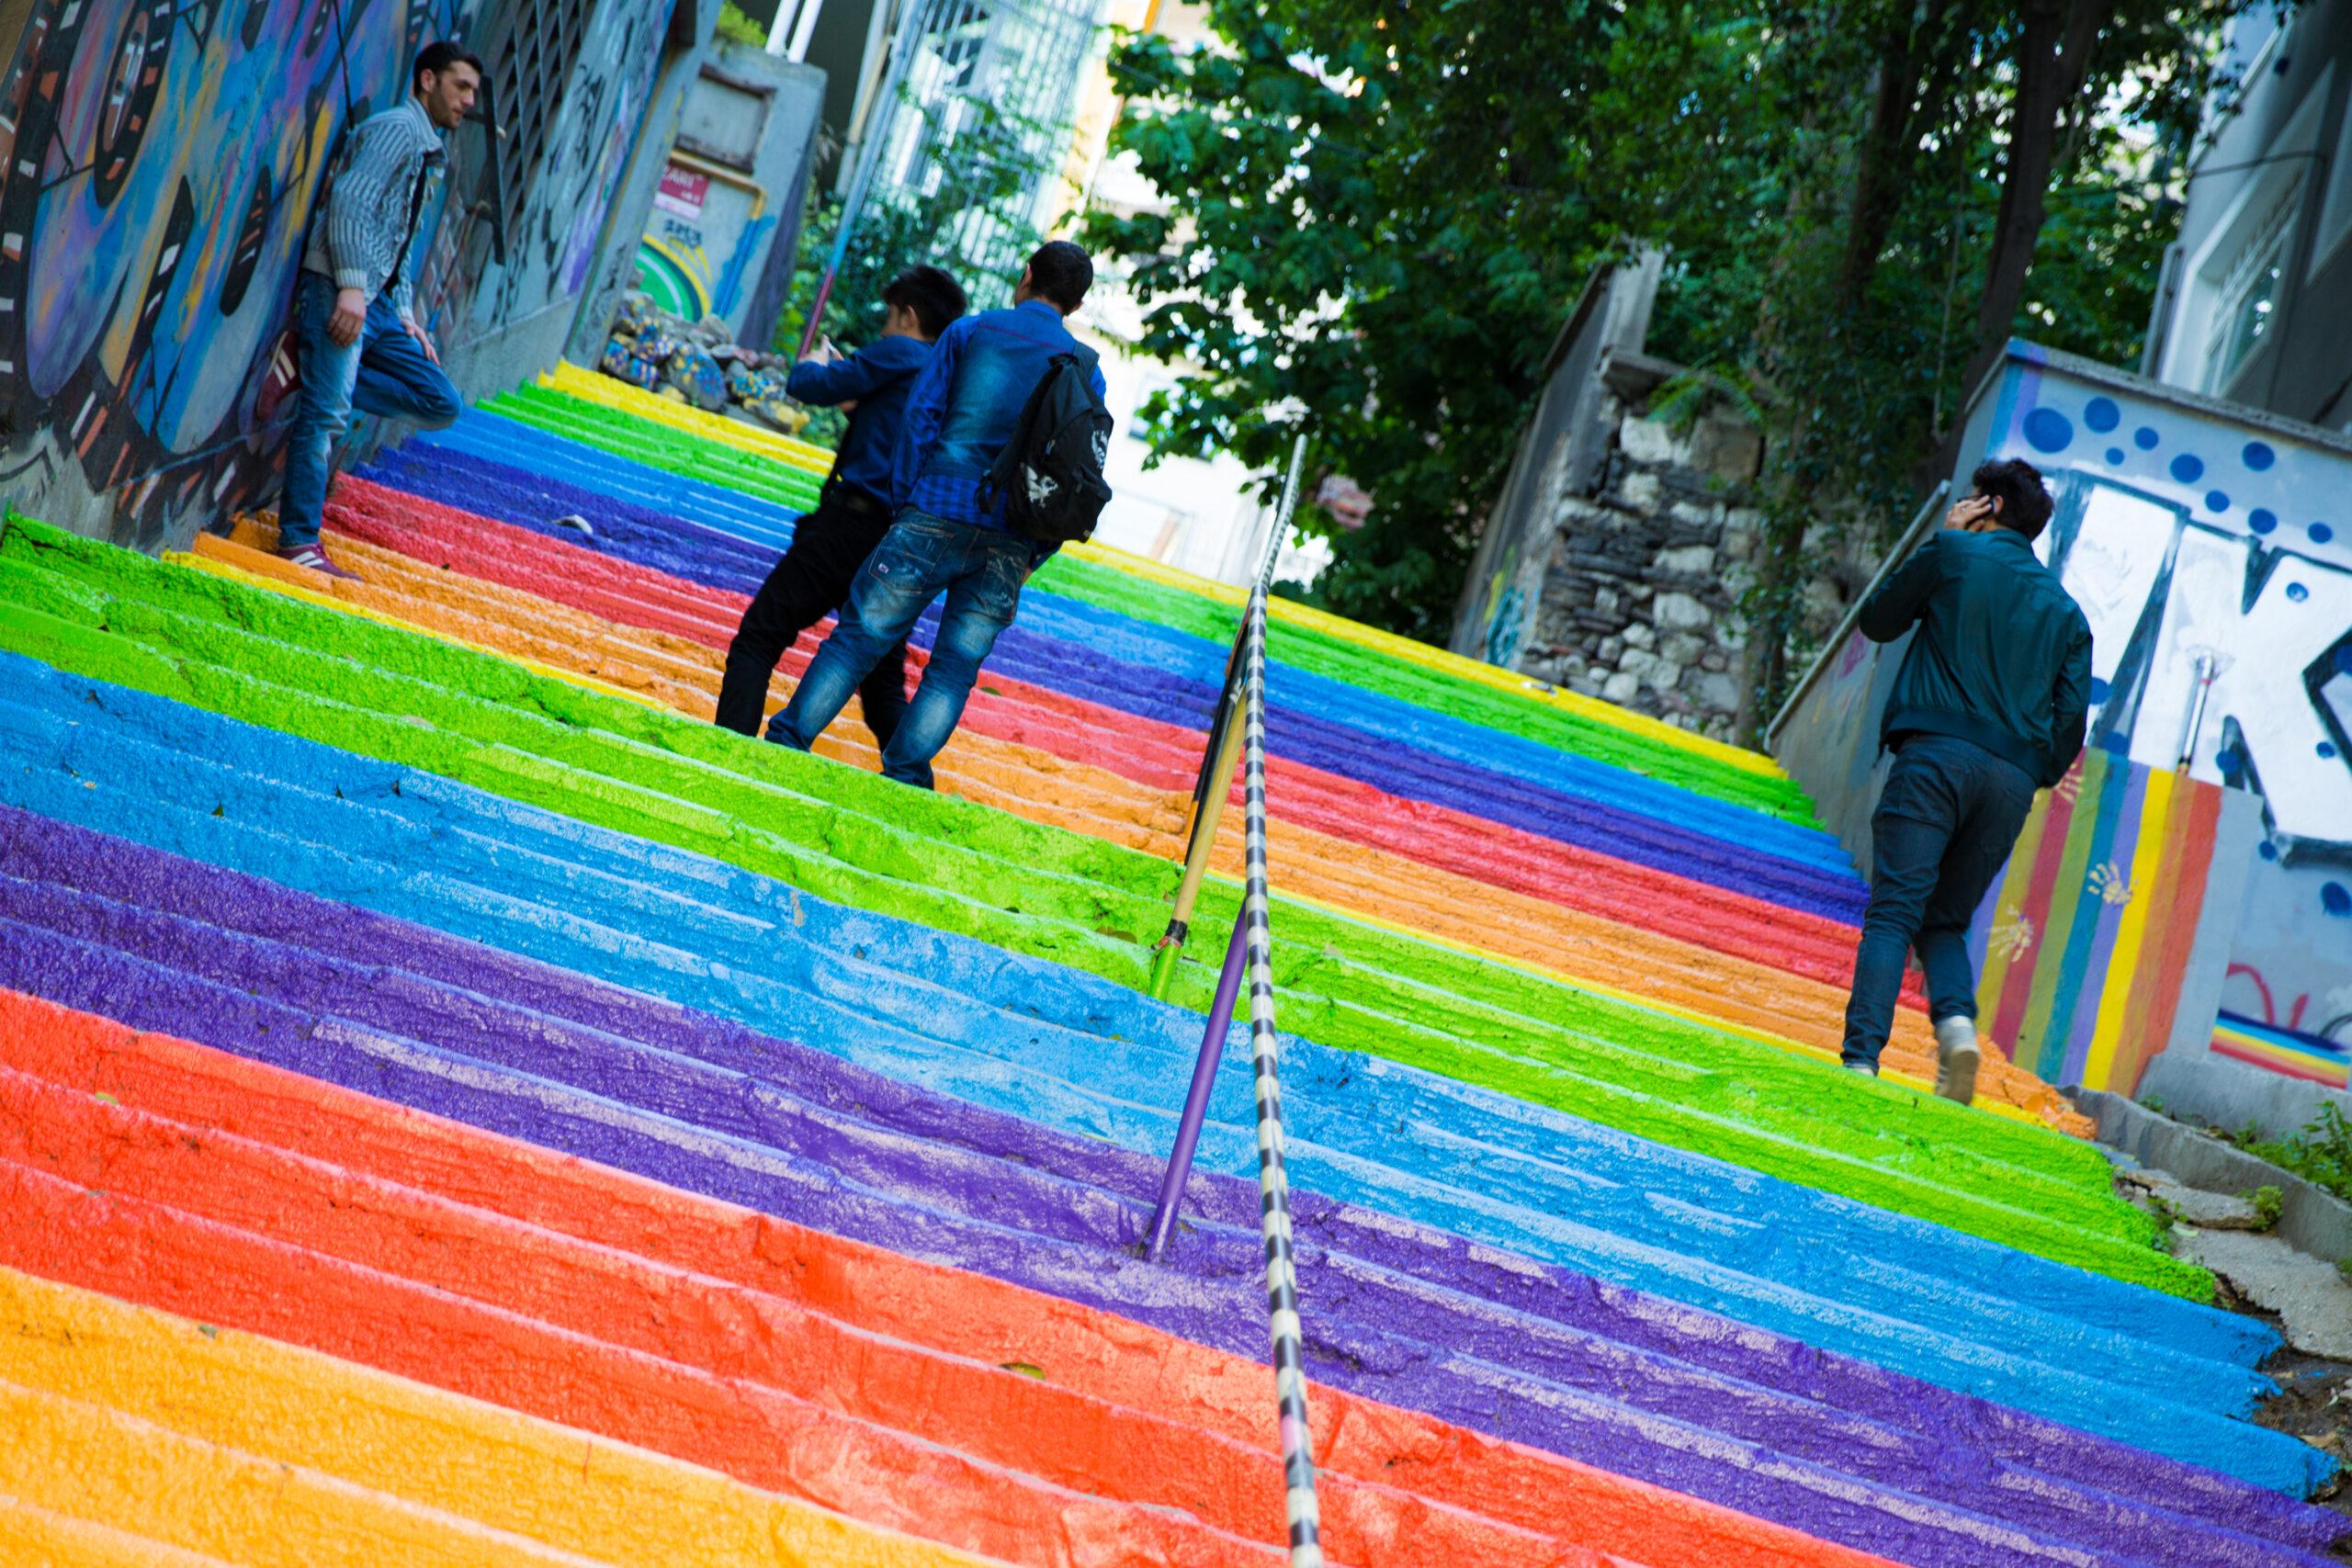 Istanbul Travel Photos | LGBTQ | THE PHOTOKITCHEN